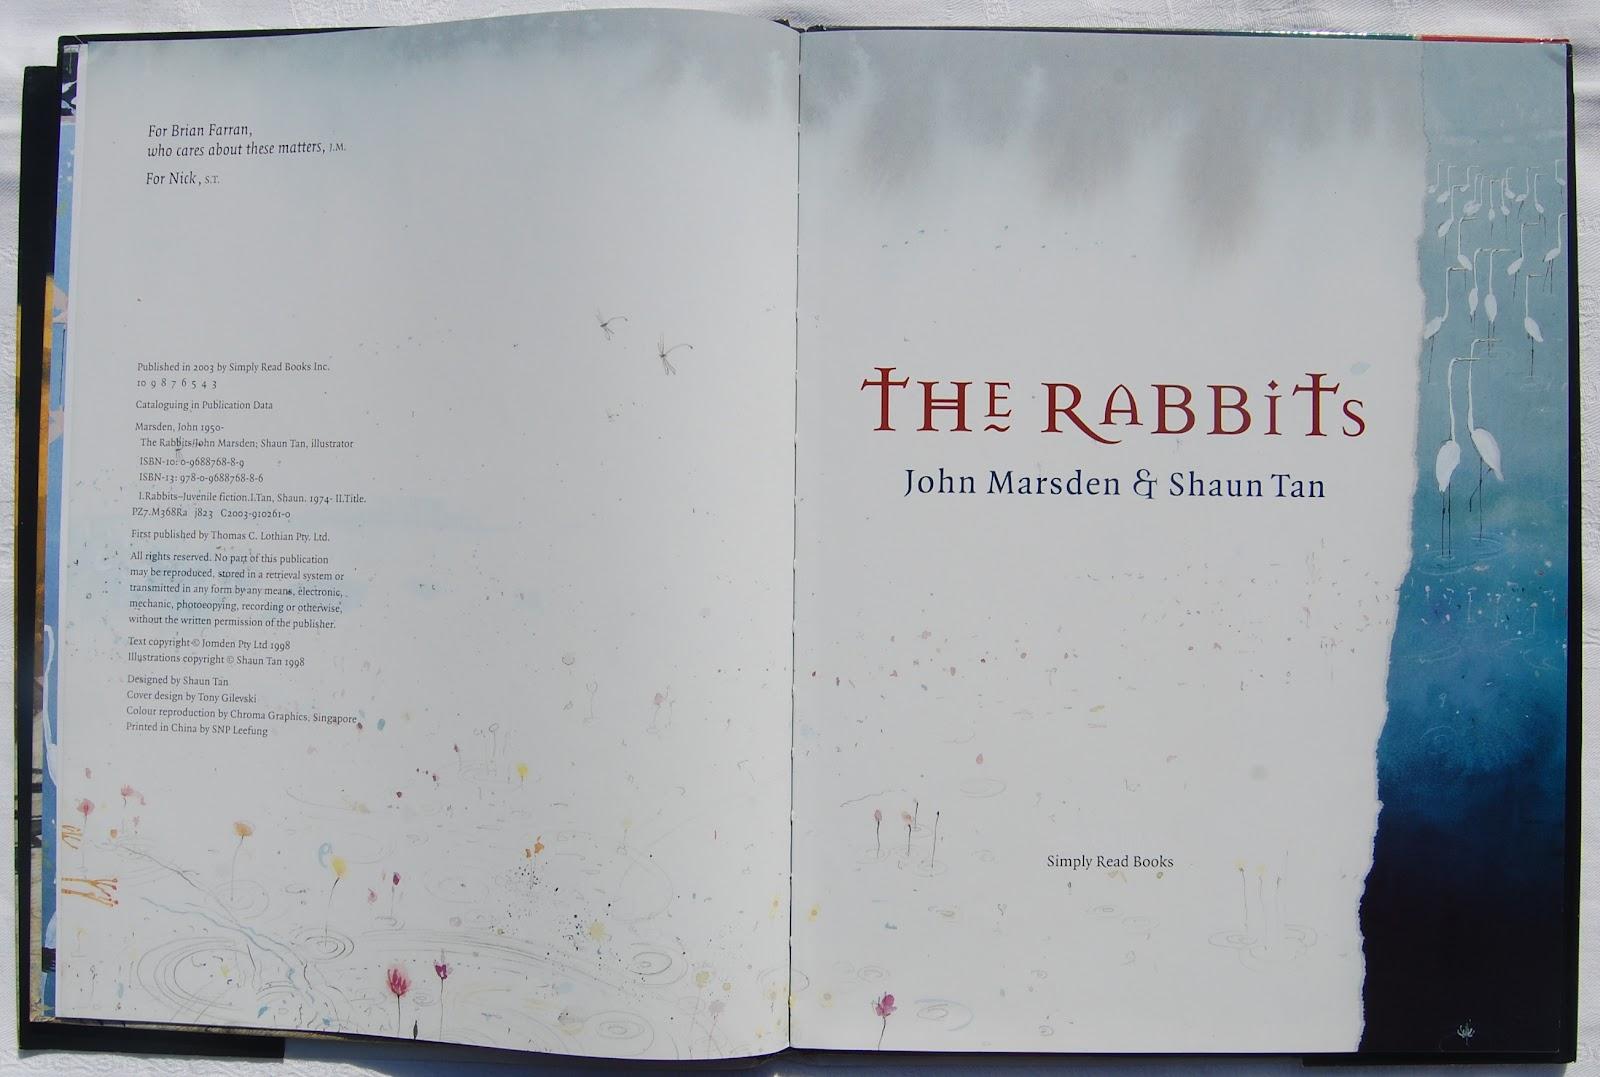 The Rabbits by Shaun Tan and John Marsden